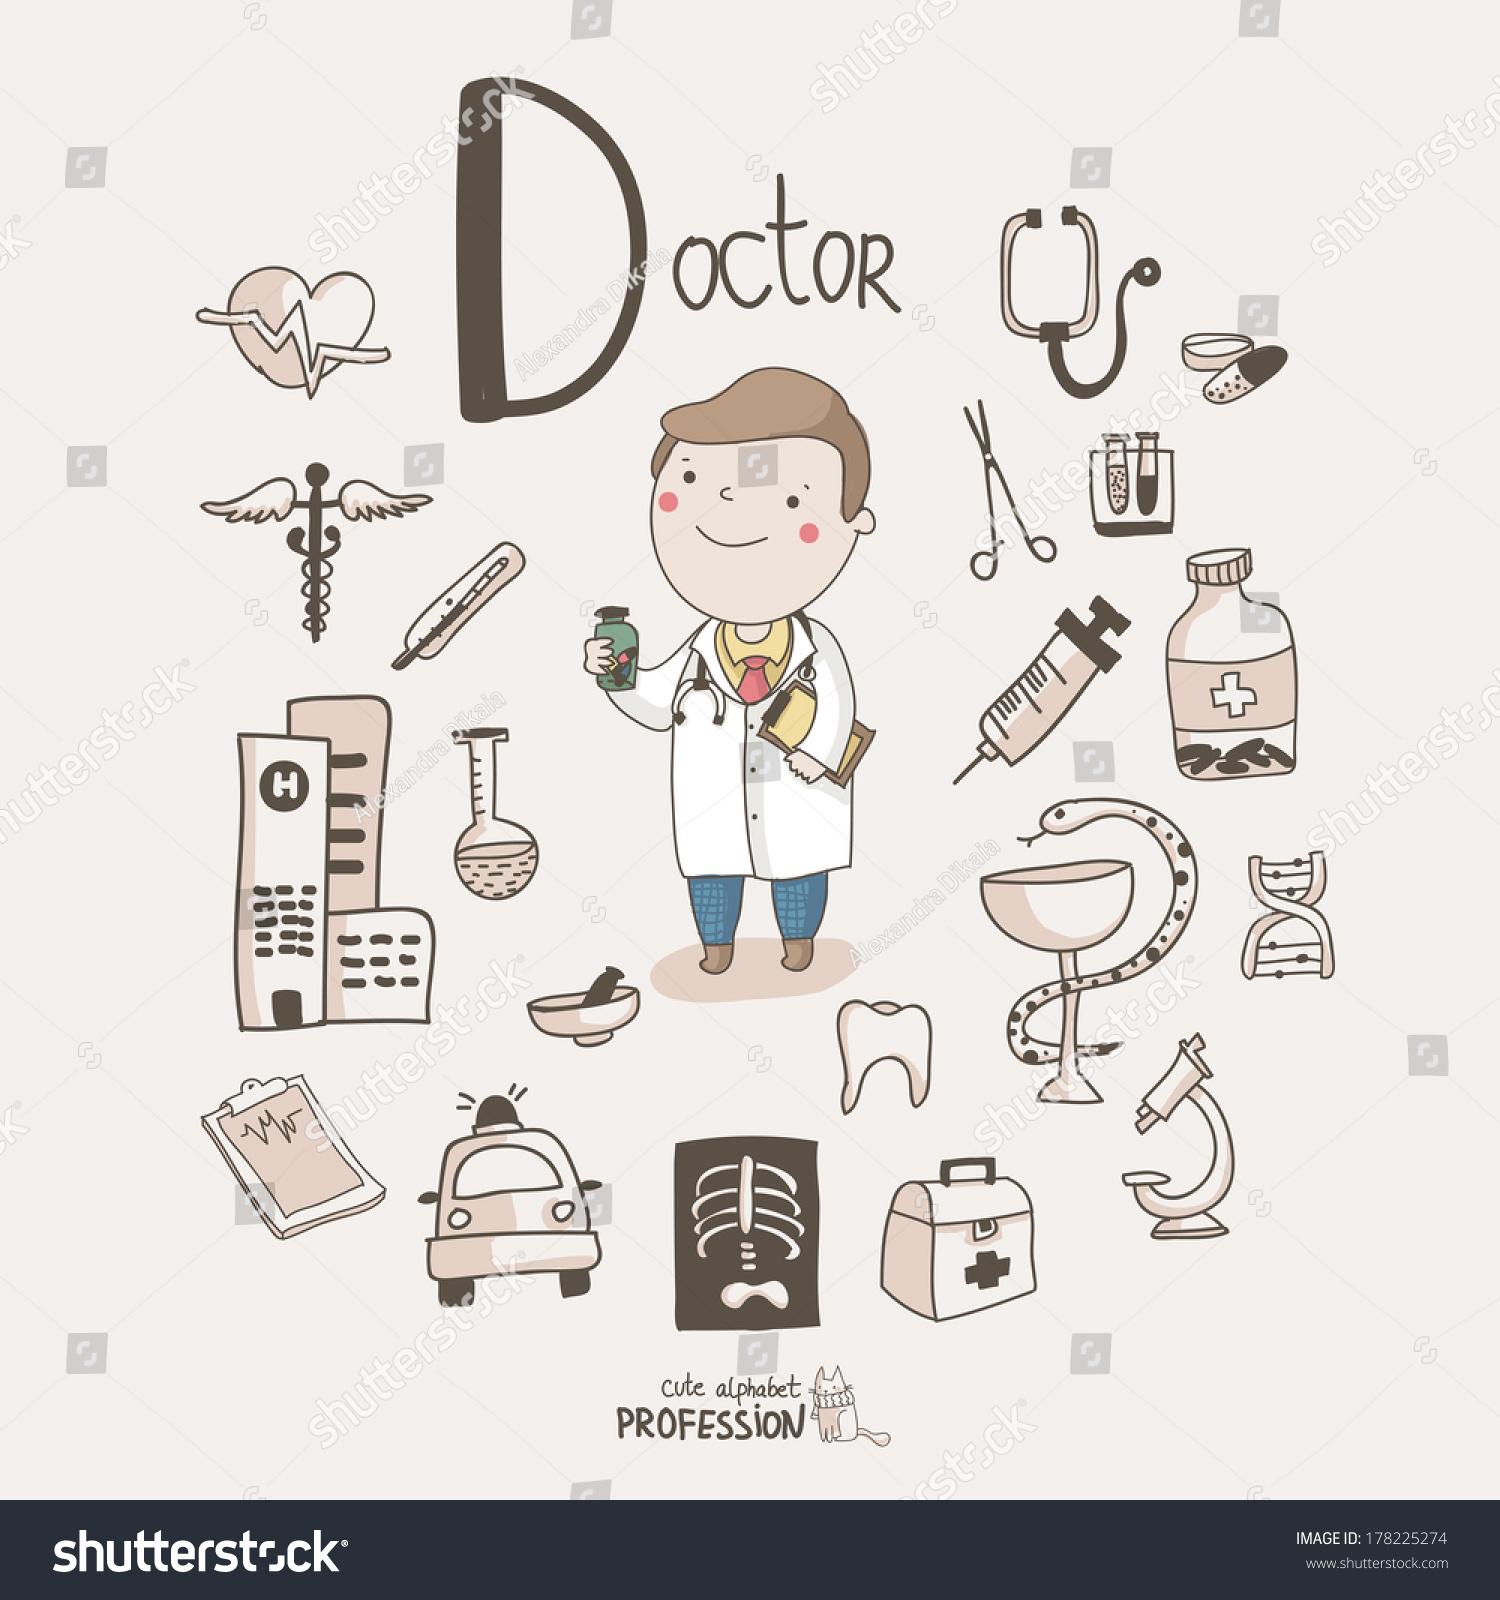 cute vector alphabet profession letter d stock vector 178225274 cute vector alphabet profession letter d doctor